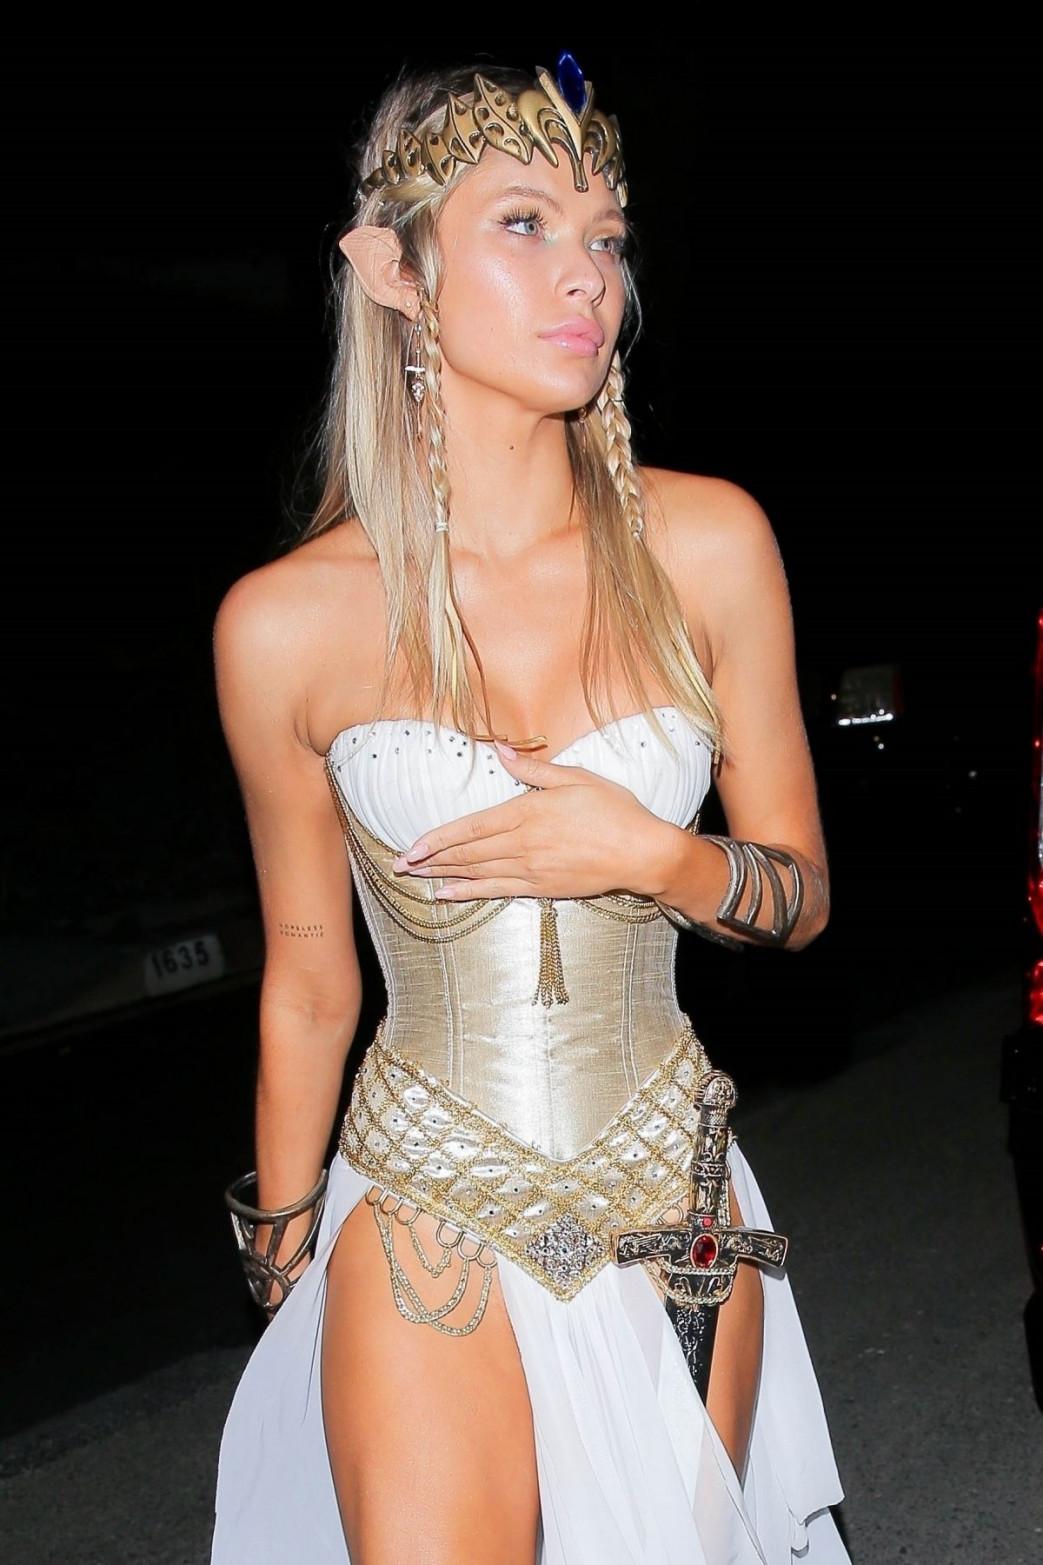 Josie-Canseco-Leggy-Cleavage-in-Halloween-Costume-9.jpg